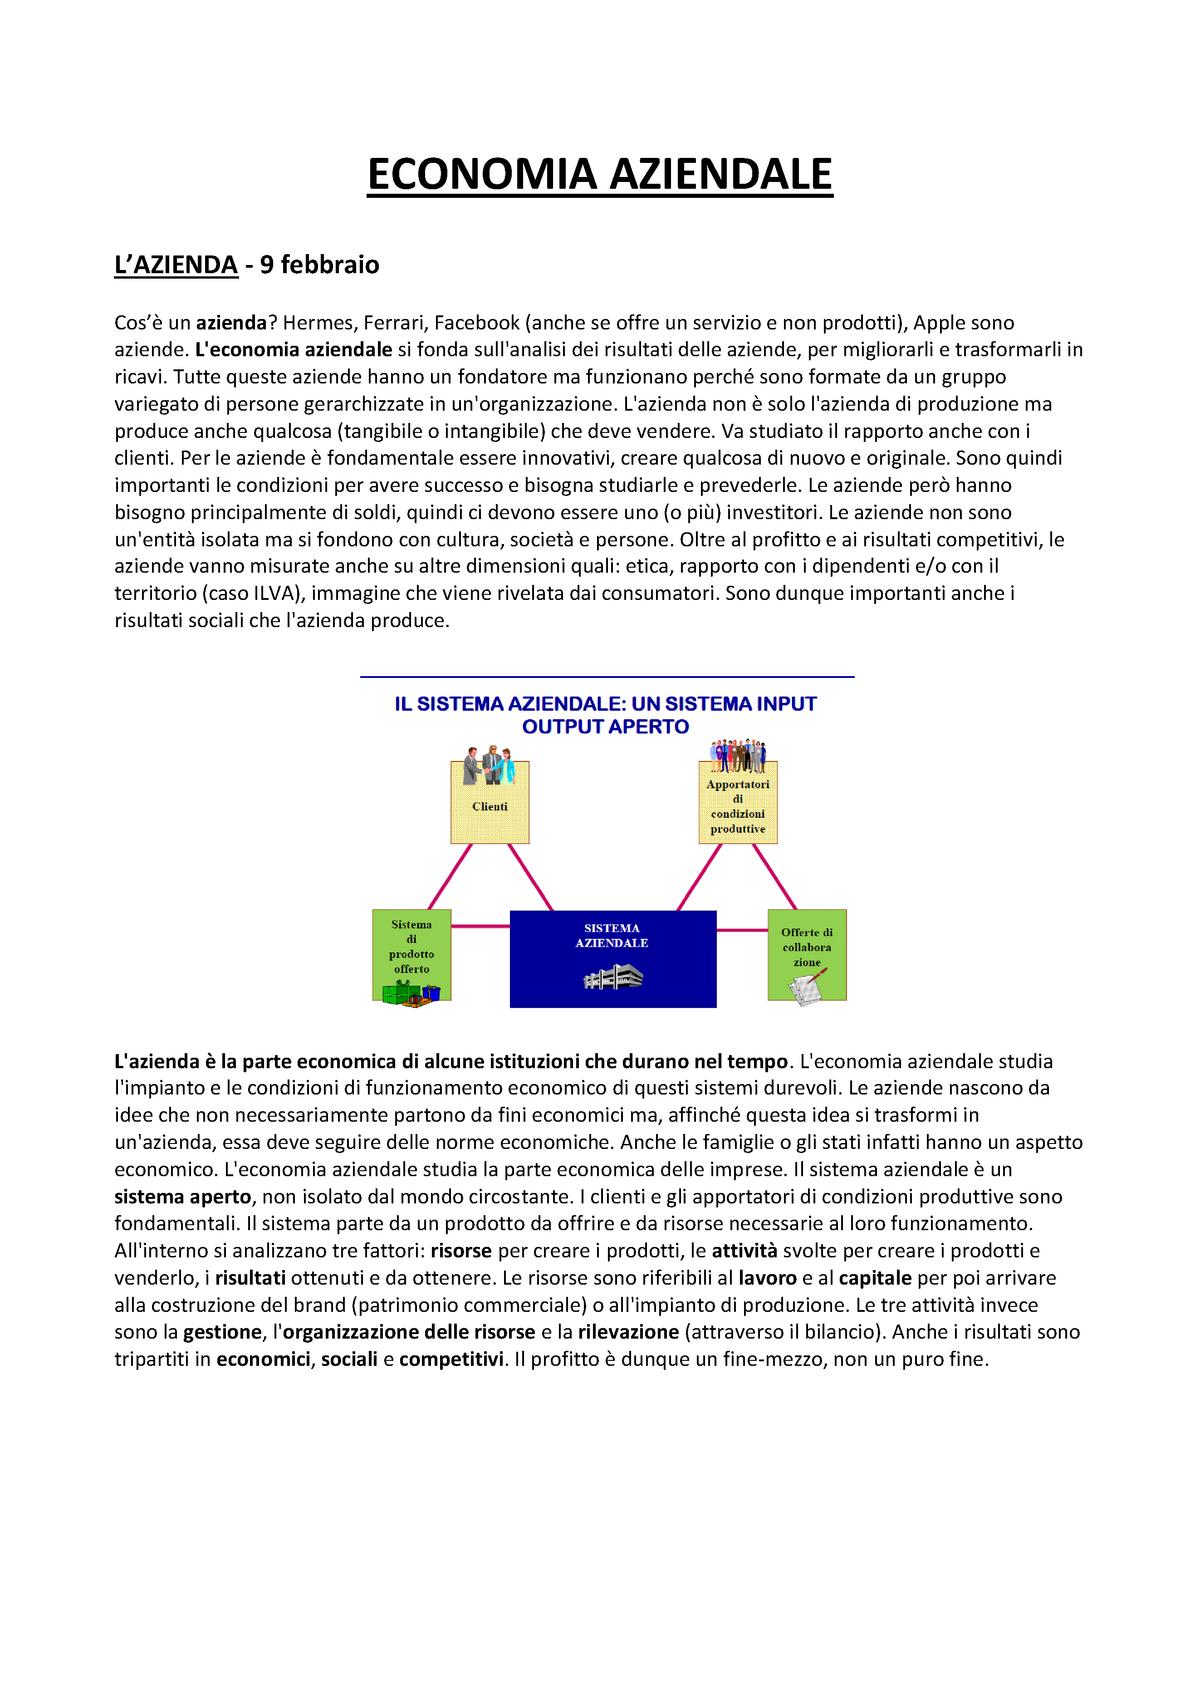 Appunti Economia aziendale IULM StuDocu